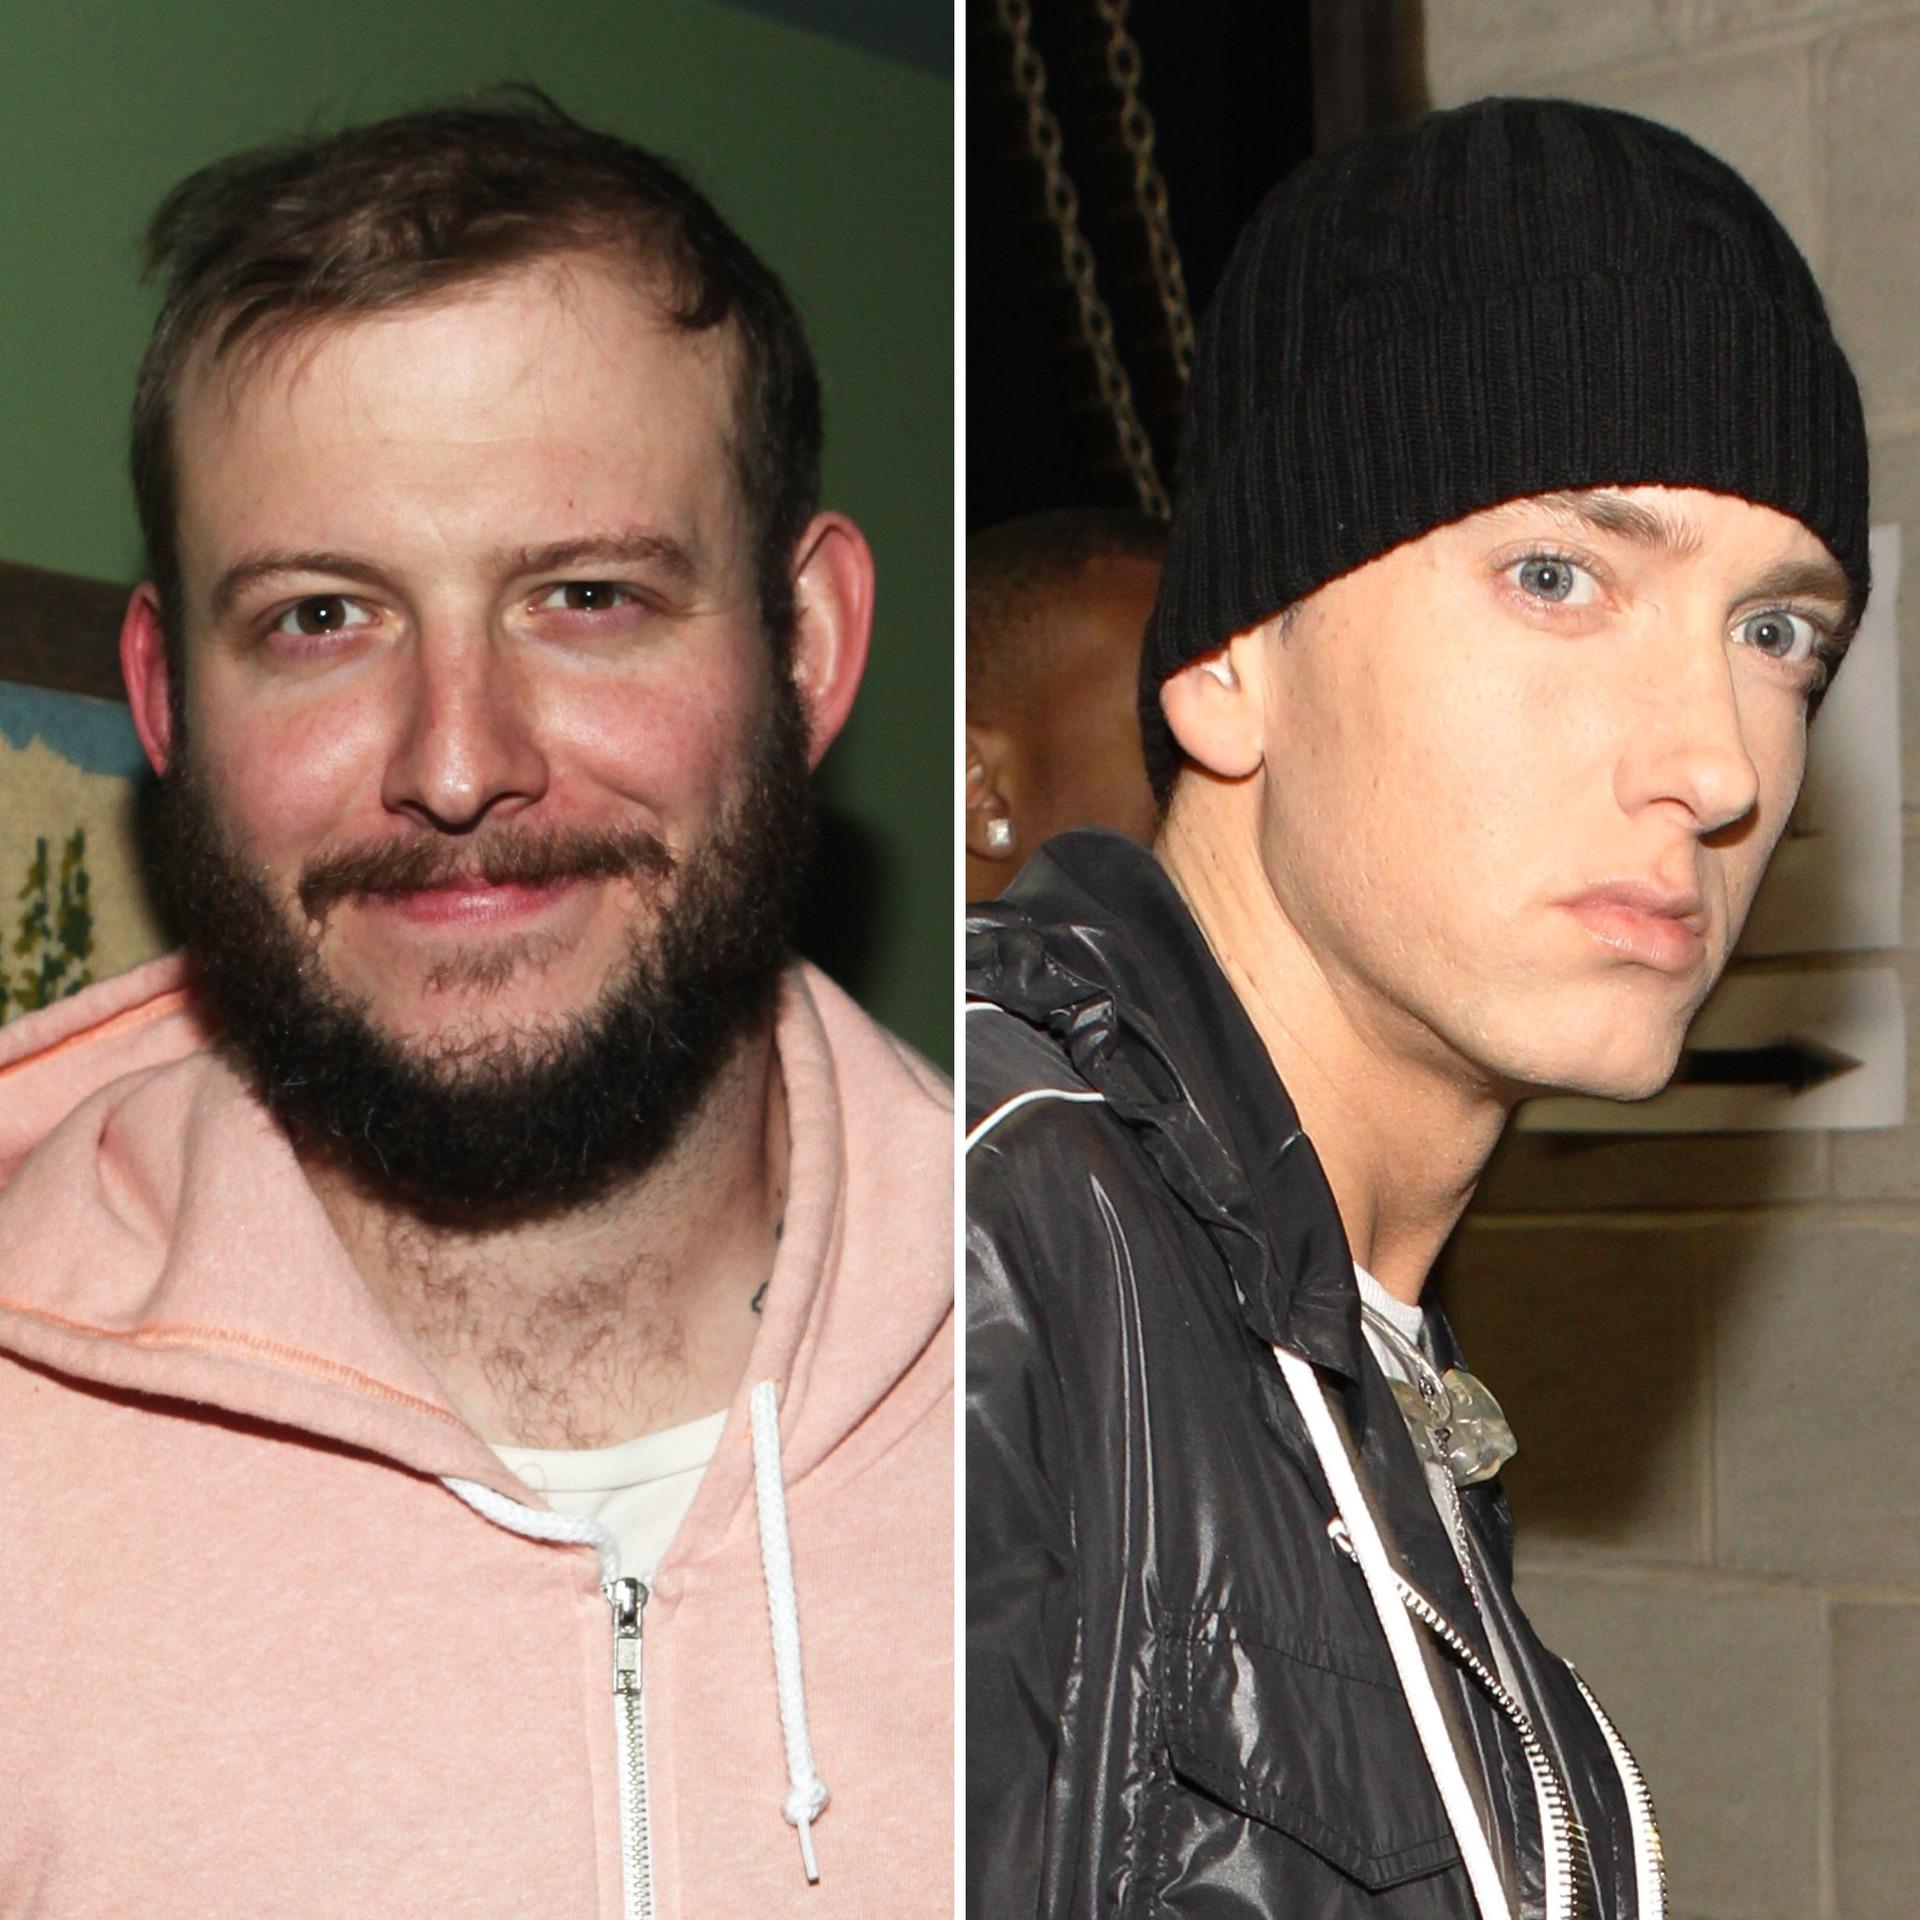 6635504e28b8 Why Bon Iver wants to  kill  Eminem track over homophic slur - NZ Herald